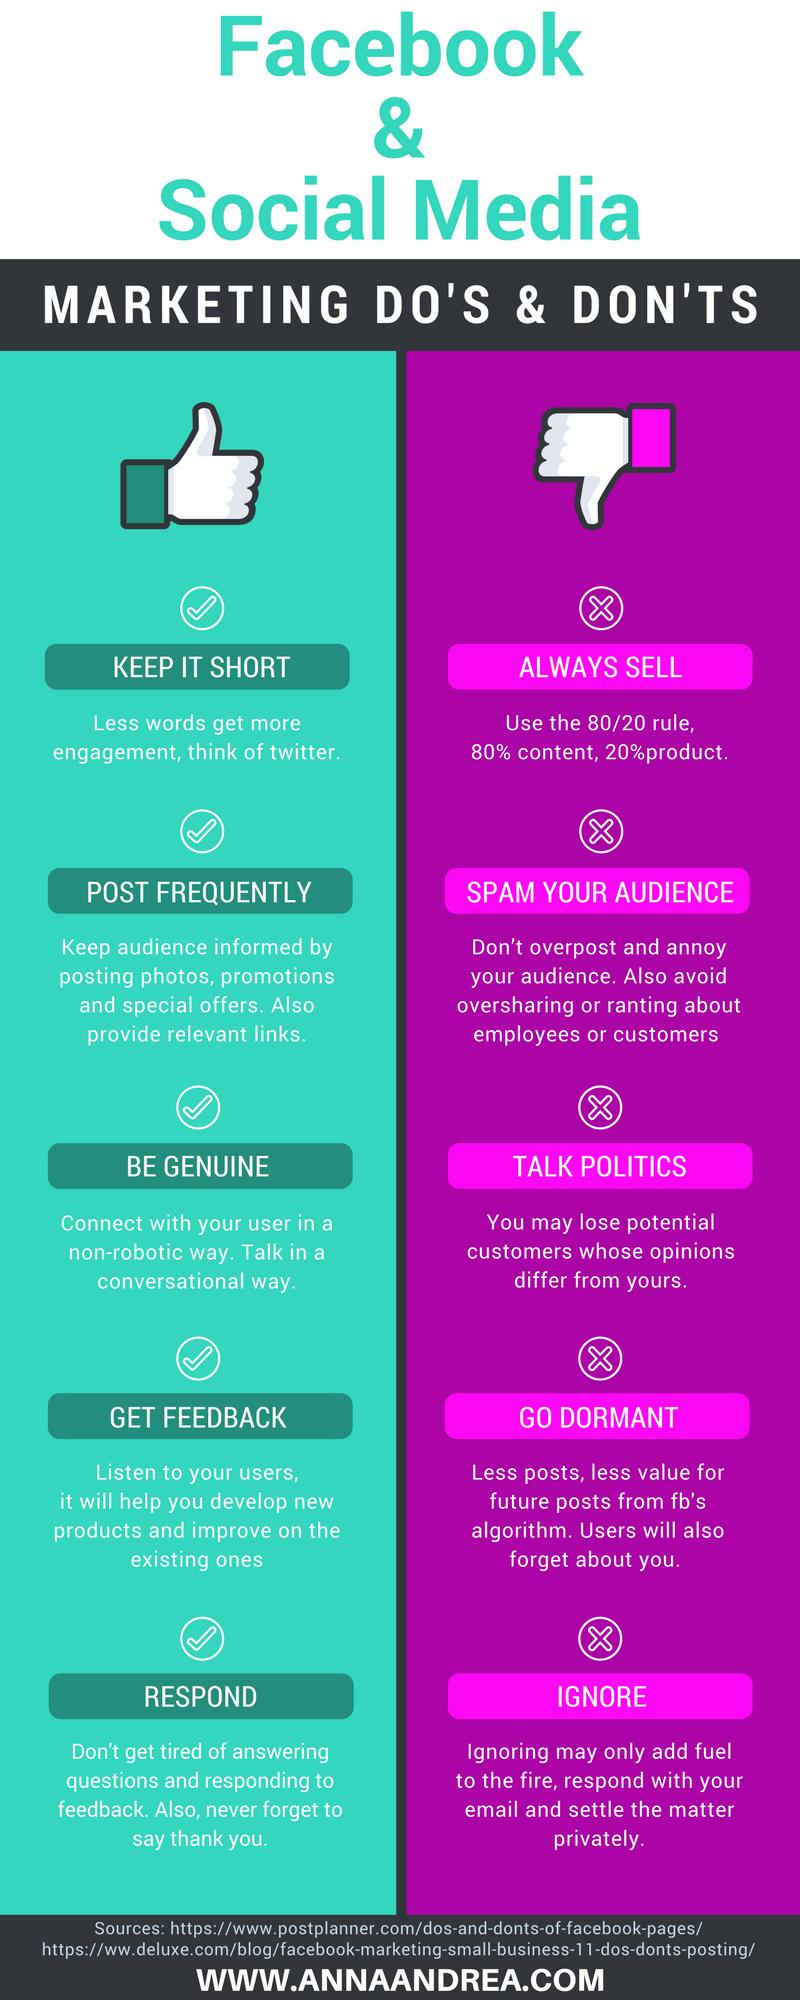 social-media-marketing-dos-and-donts-anna-andrea